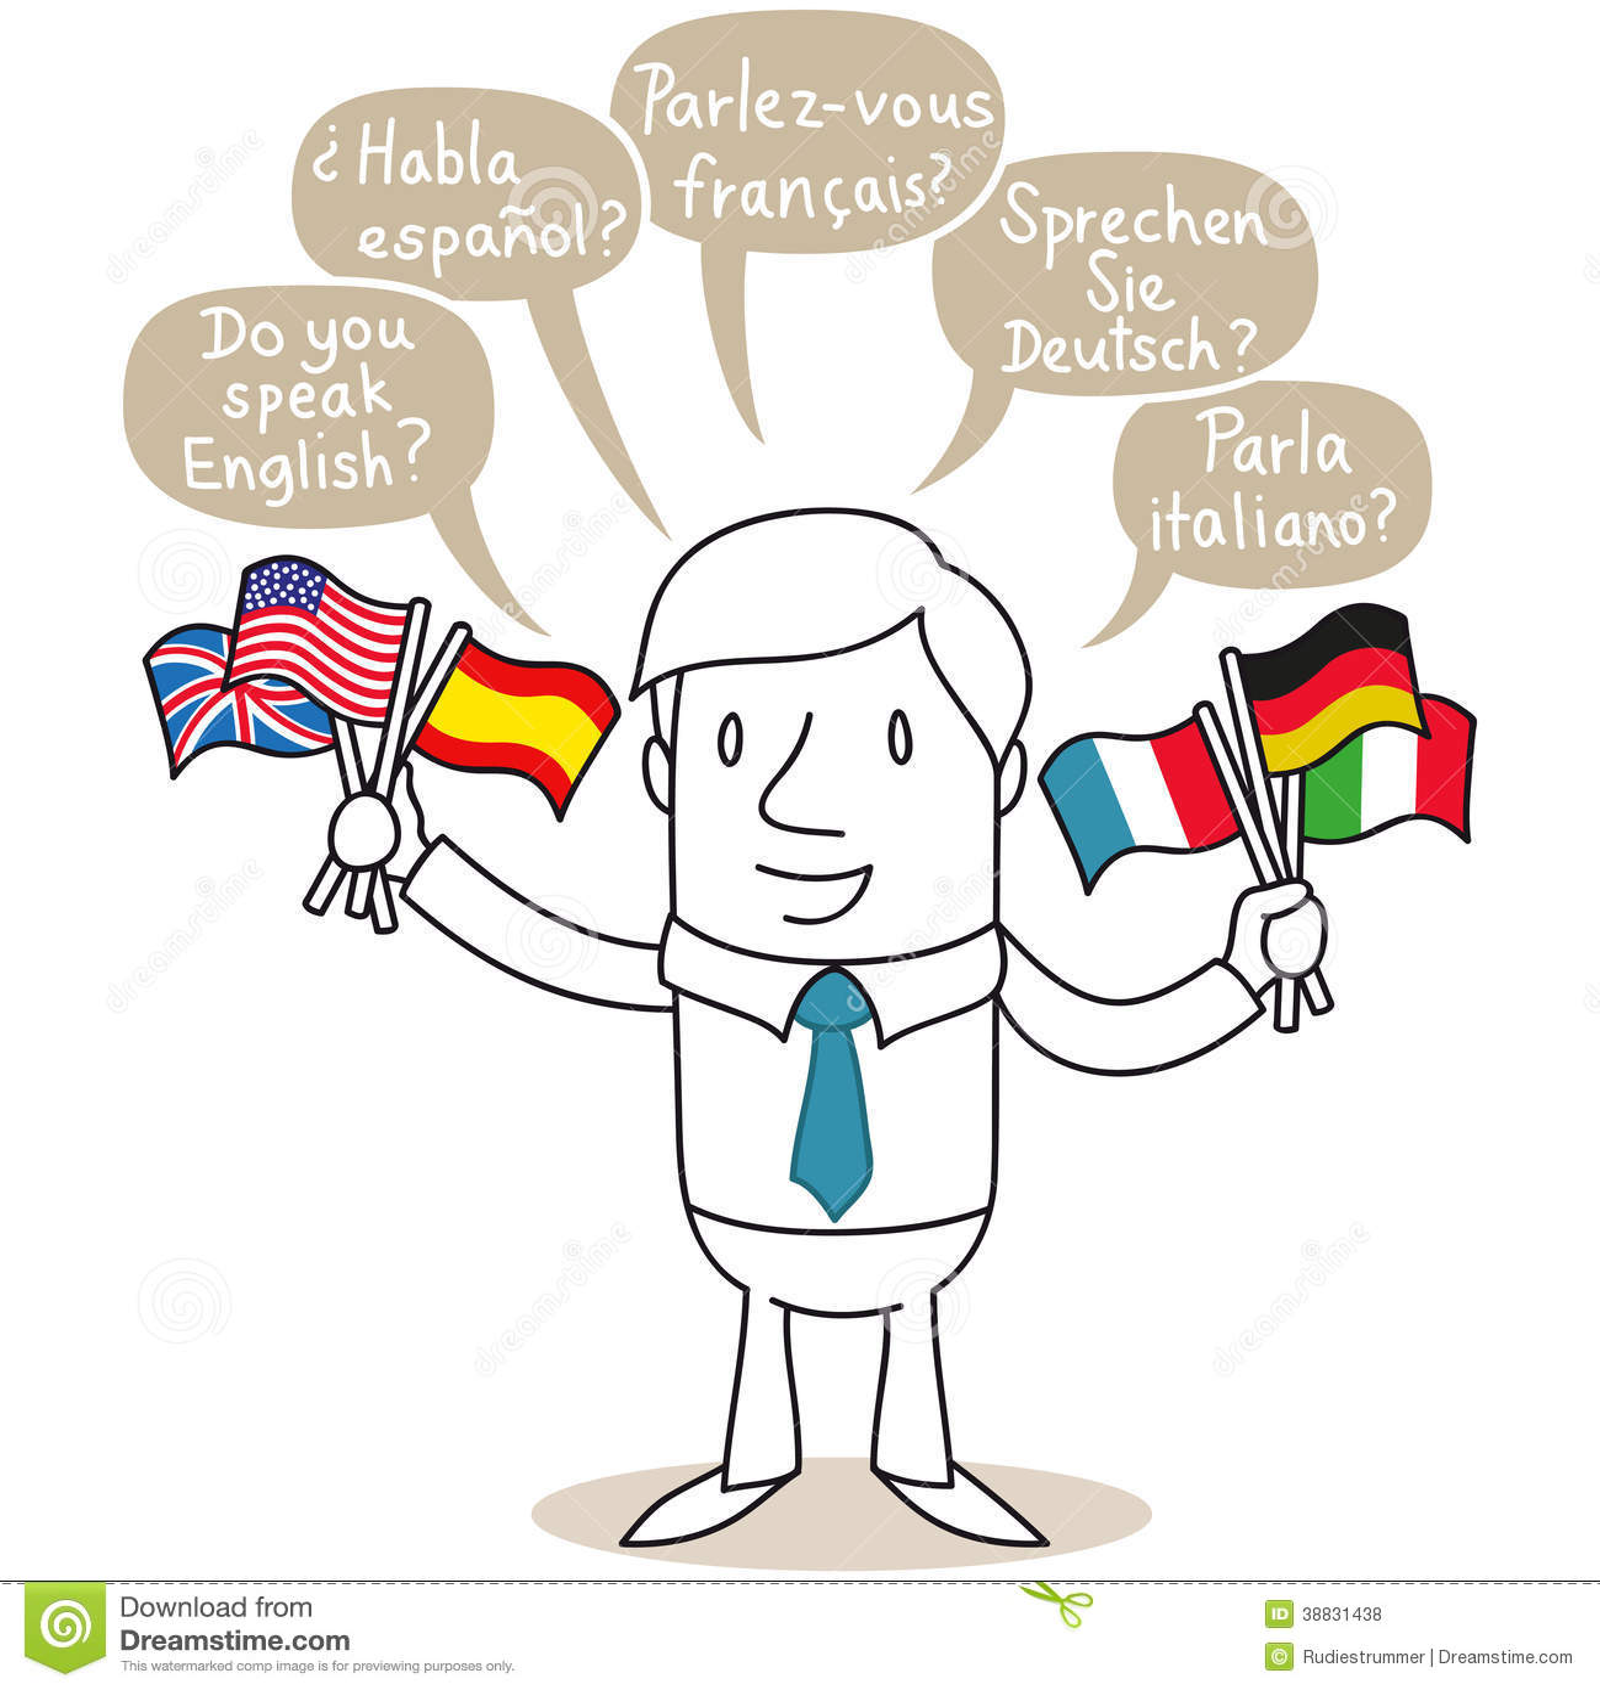 how to speak p language